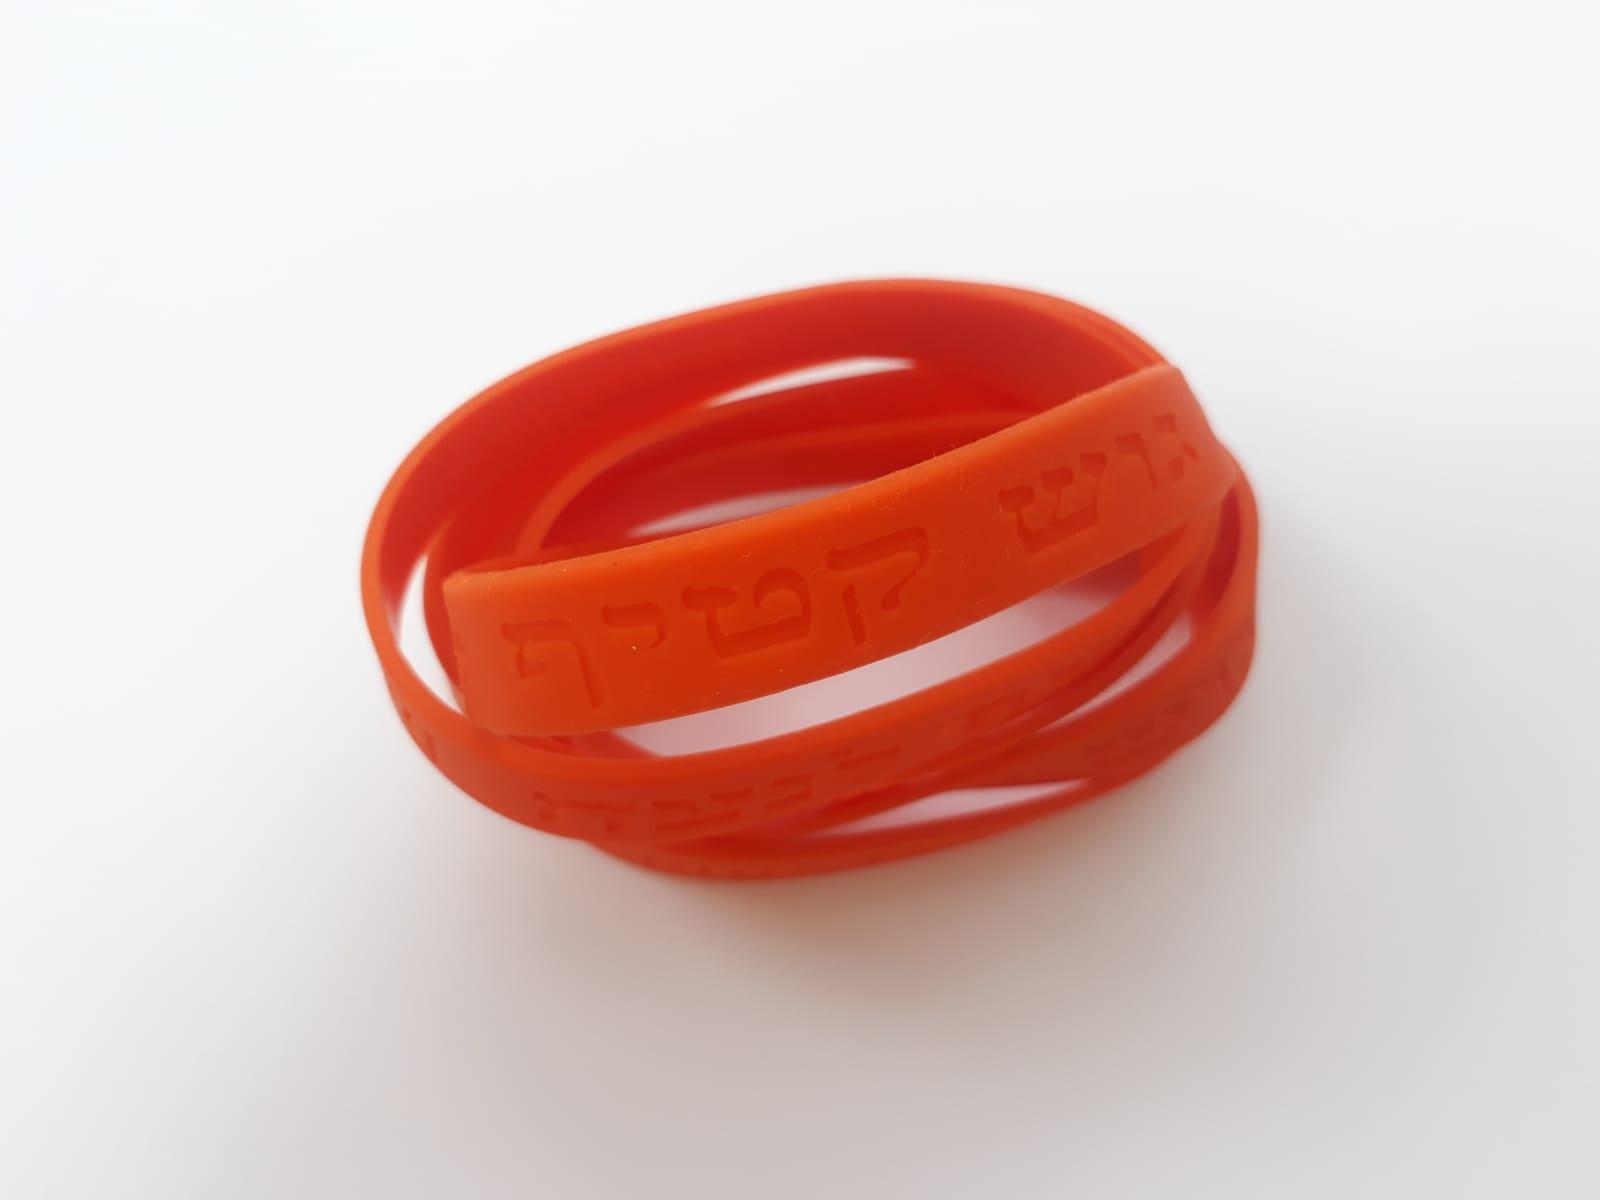 Orange 'Gush Katif Forever' (Hebrew) Handband